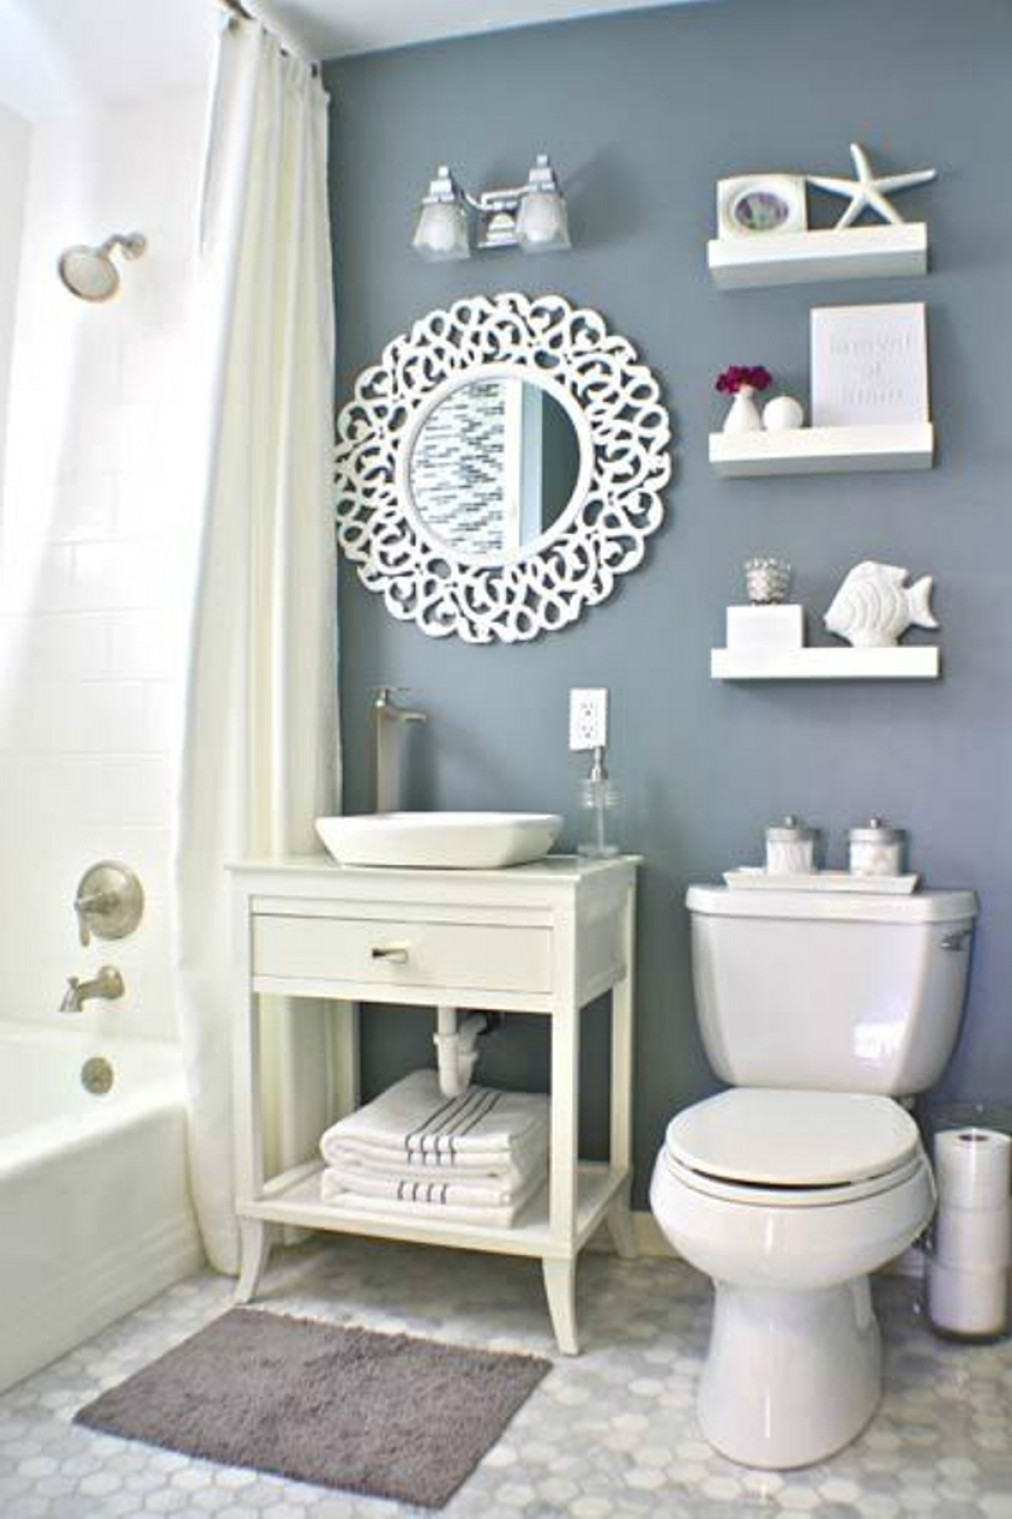 Bathrooms Design Beach Decor Bathroom, Beach Decor Bathroom